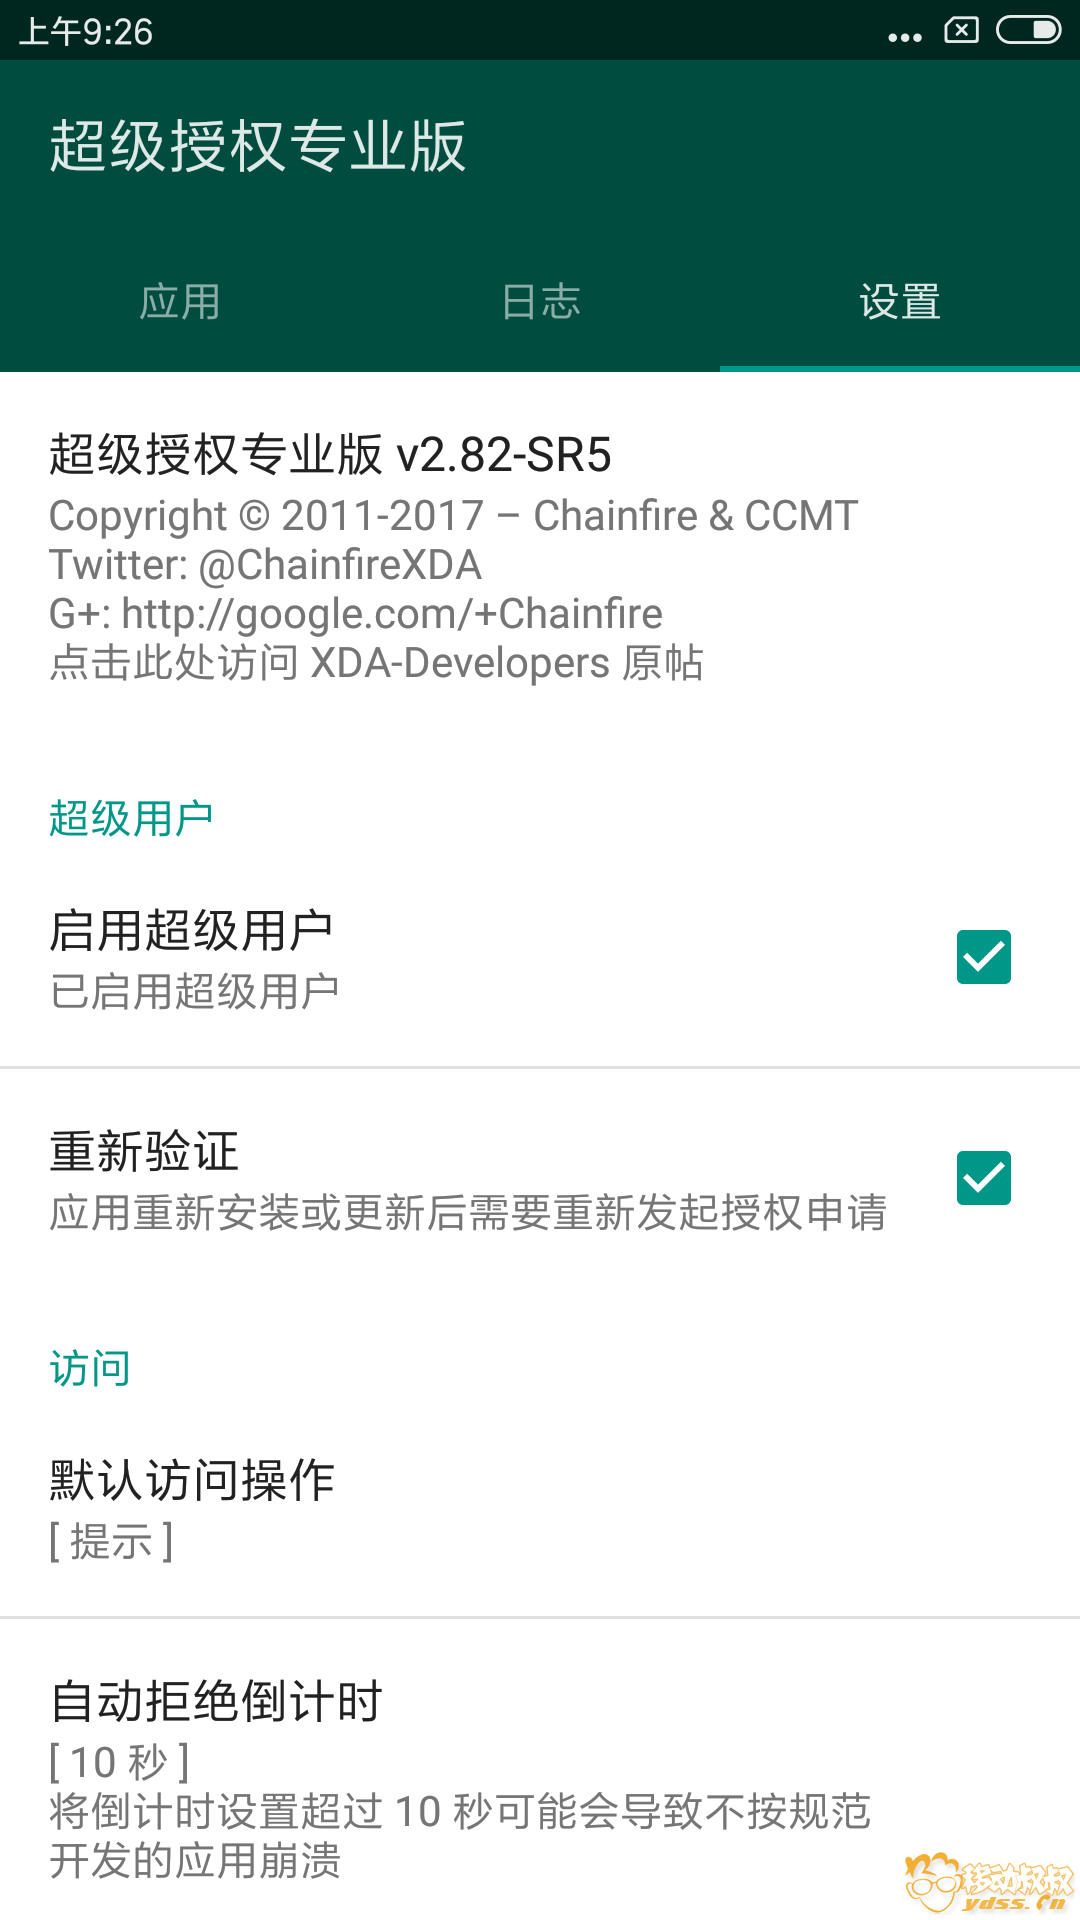 Screenshot_2018-06-07-09-26-56-385_eu.chainfire.supersu.png